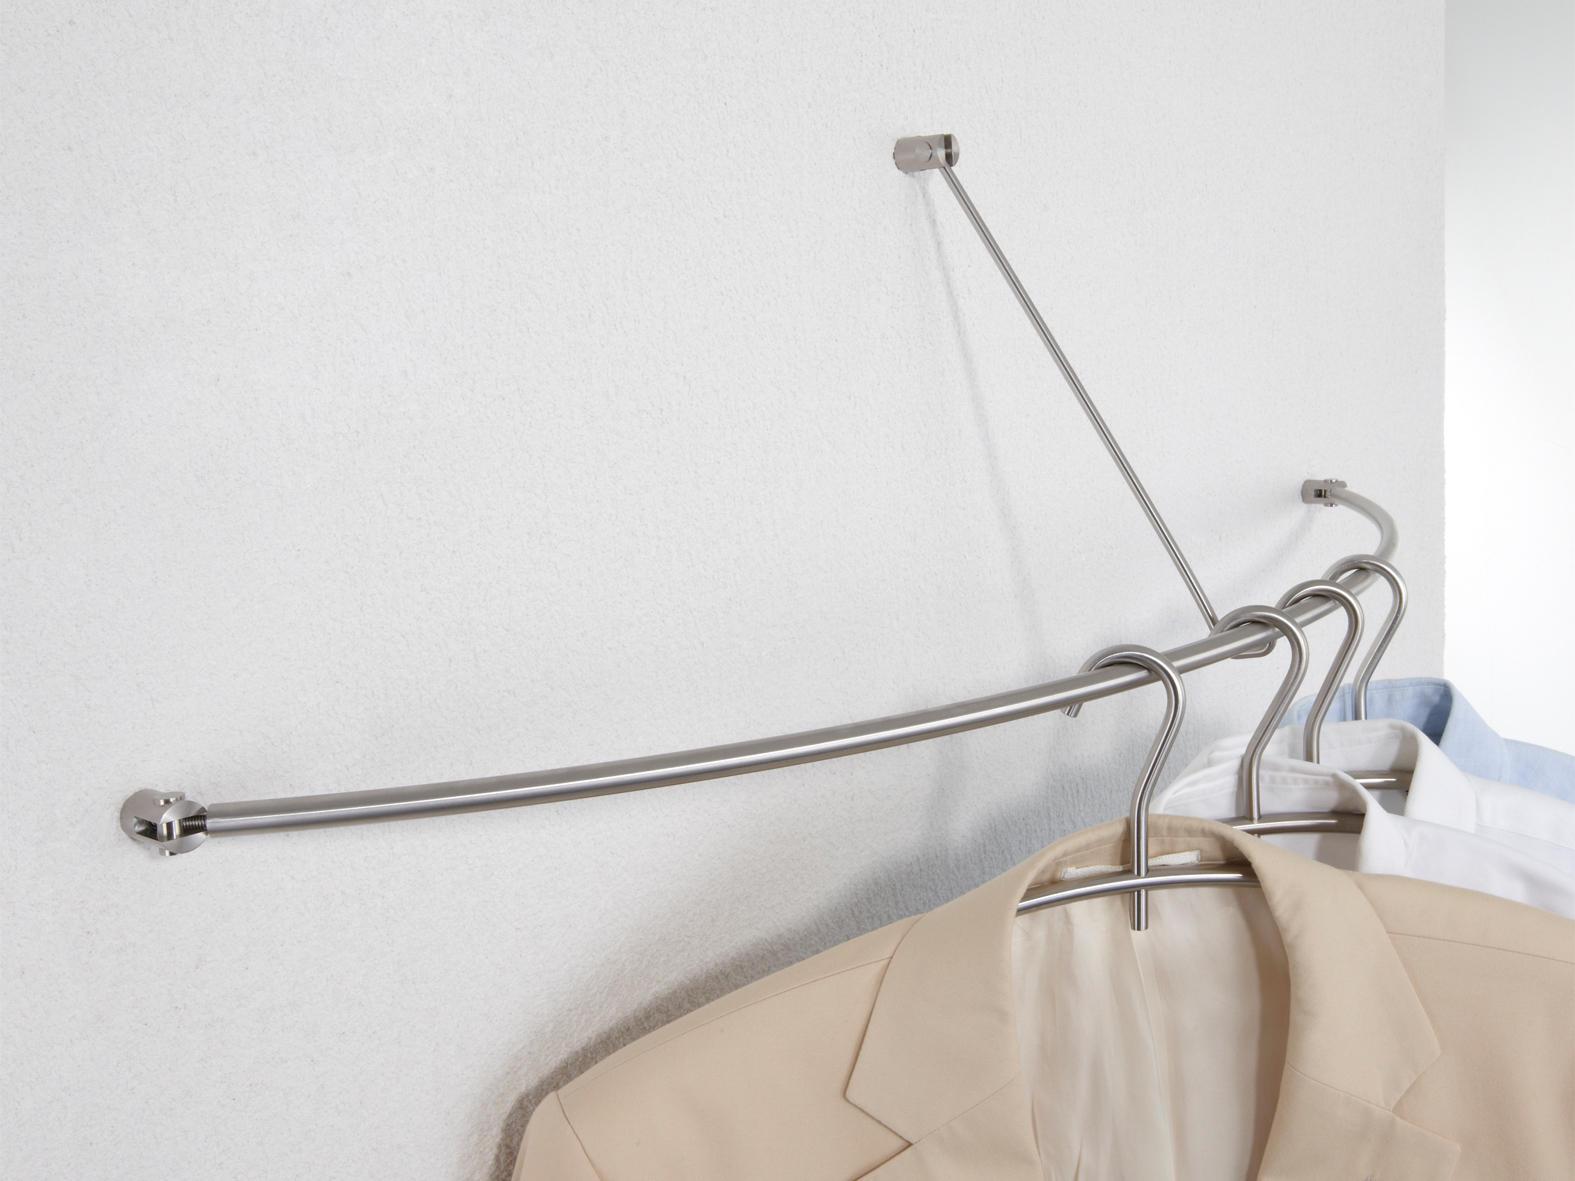 Phos Design wandgarderobe gebogen g 45 - coat racks from phos design | architonic